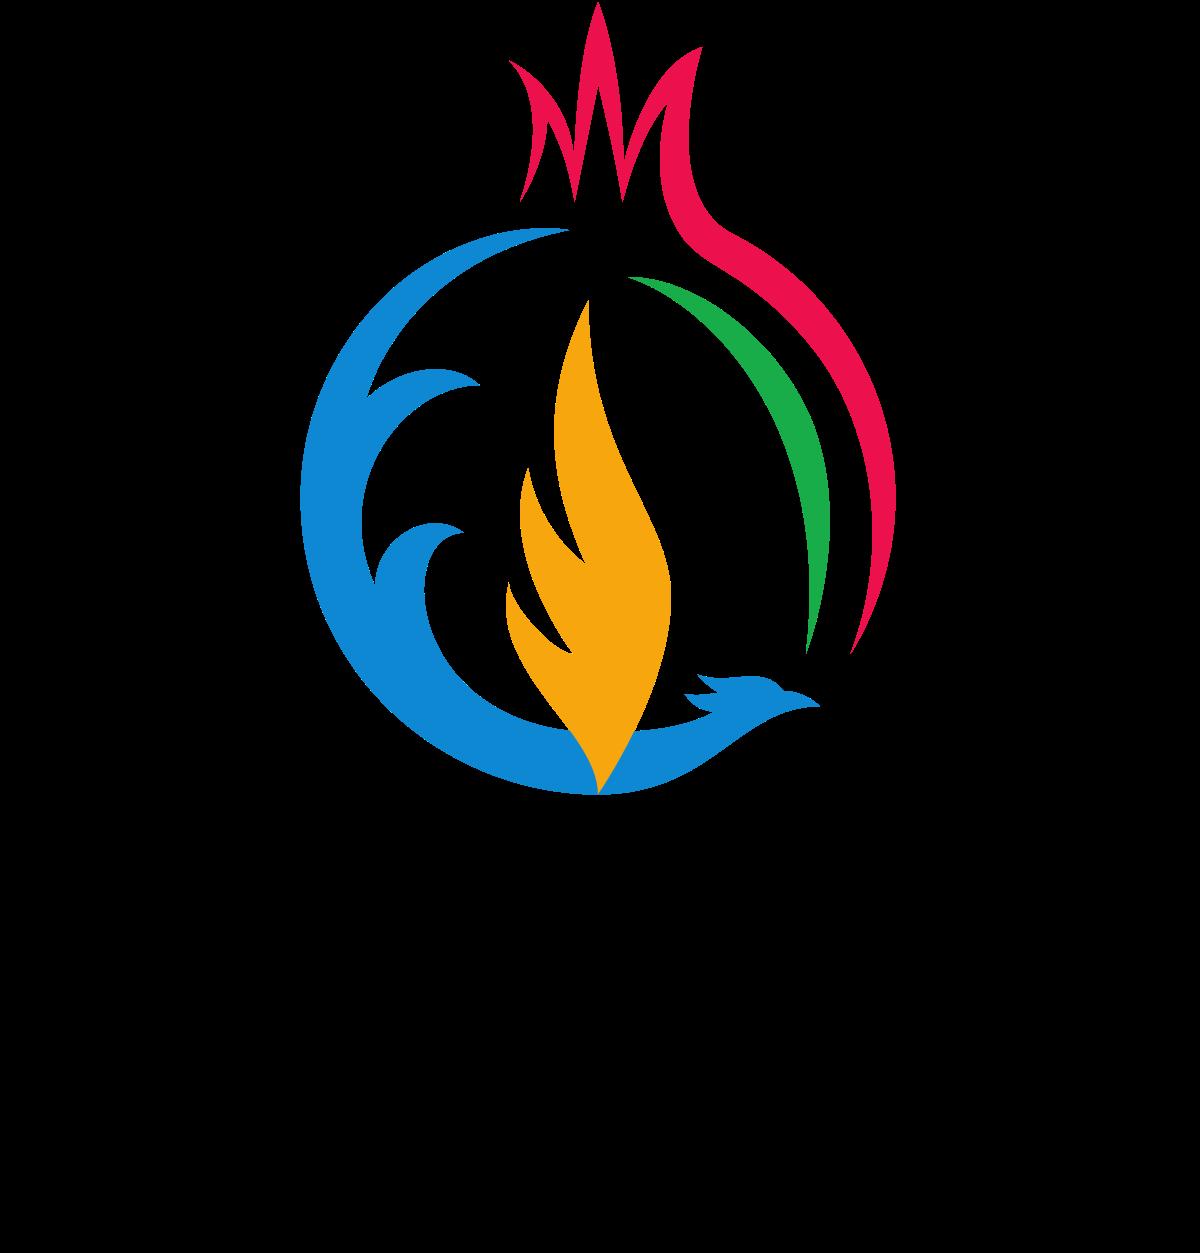 European Games Baku 2015